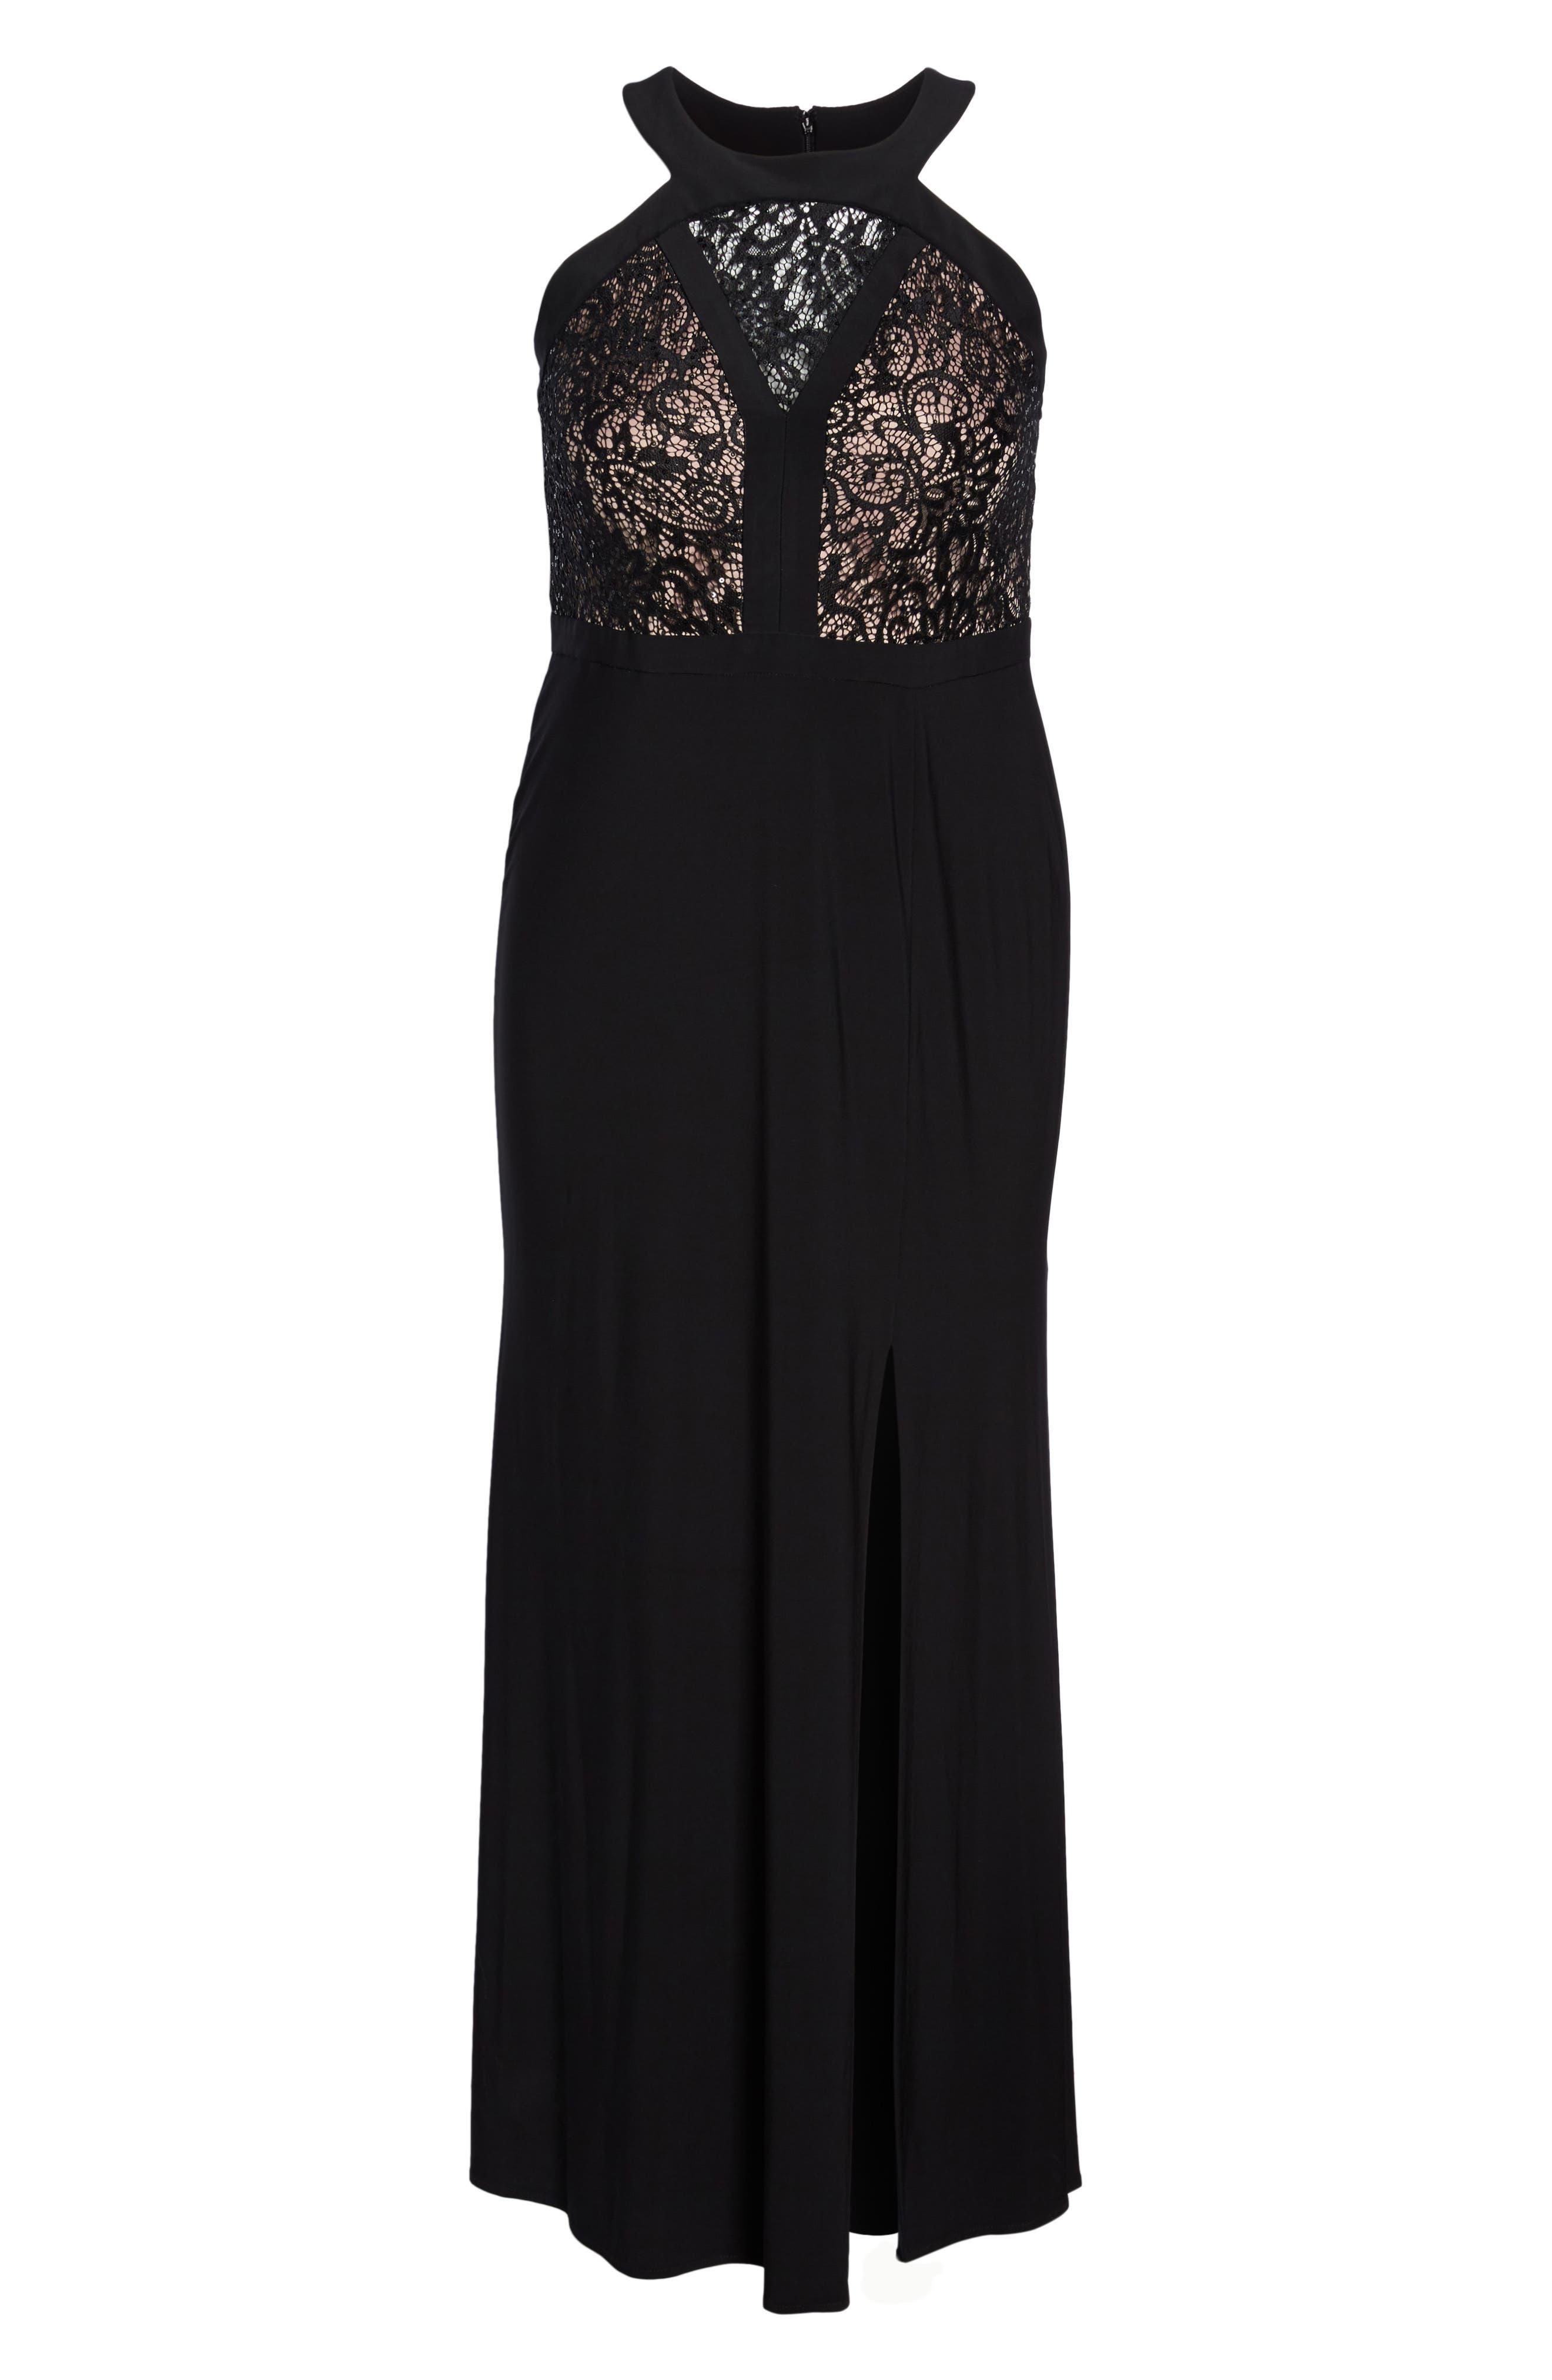 MORGAN & CO.,                             Lace Bodice Dress,                             Alternate thumbnail 6, color,                             BLACK/ NUDE